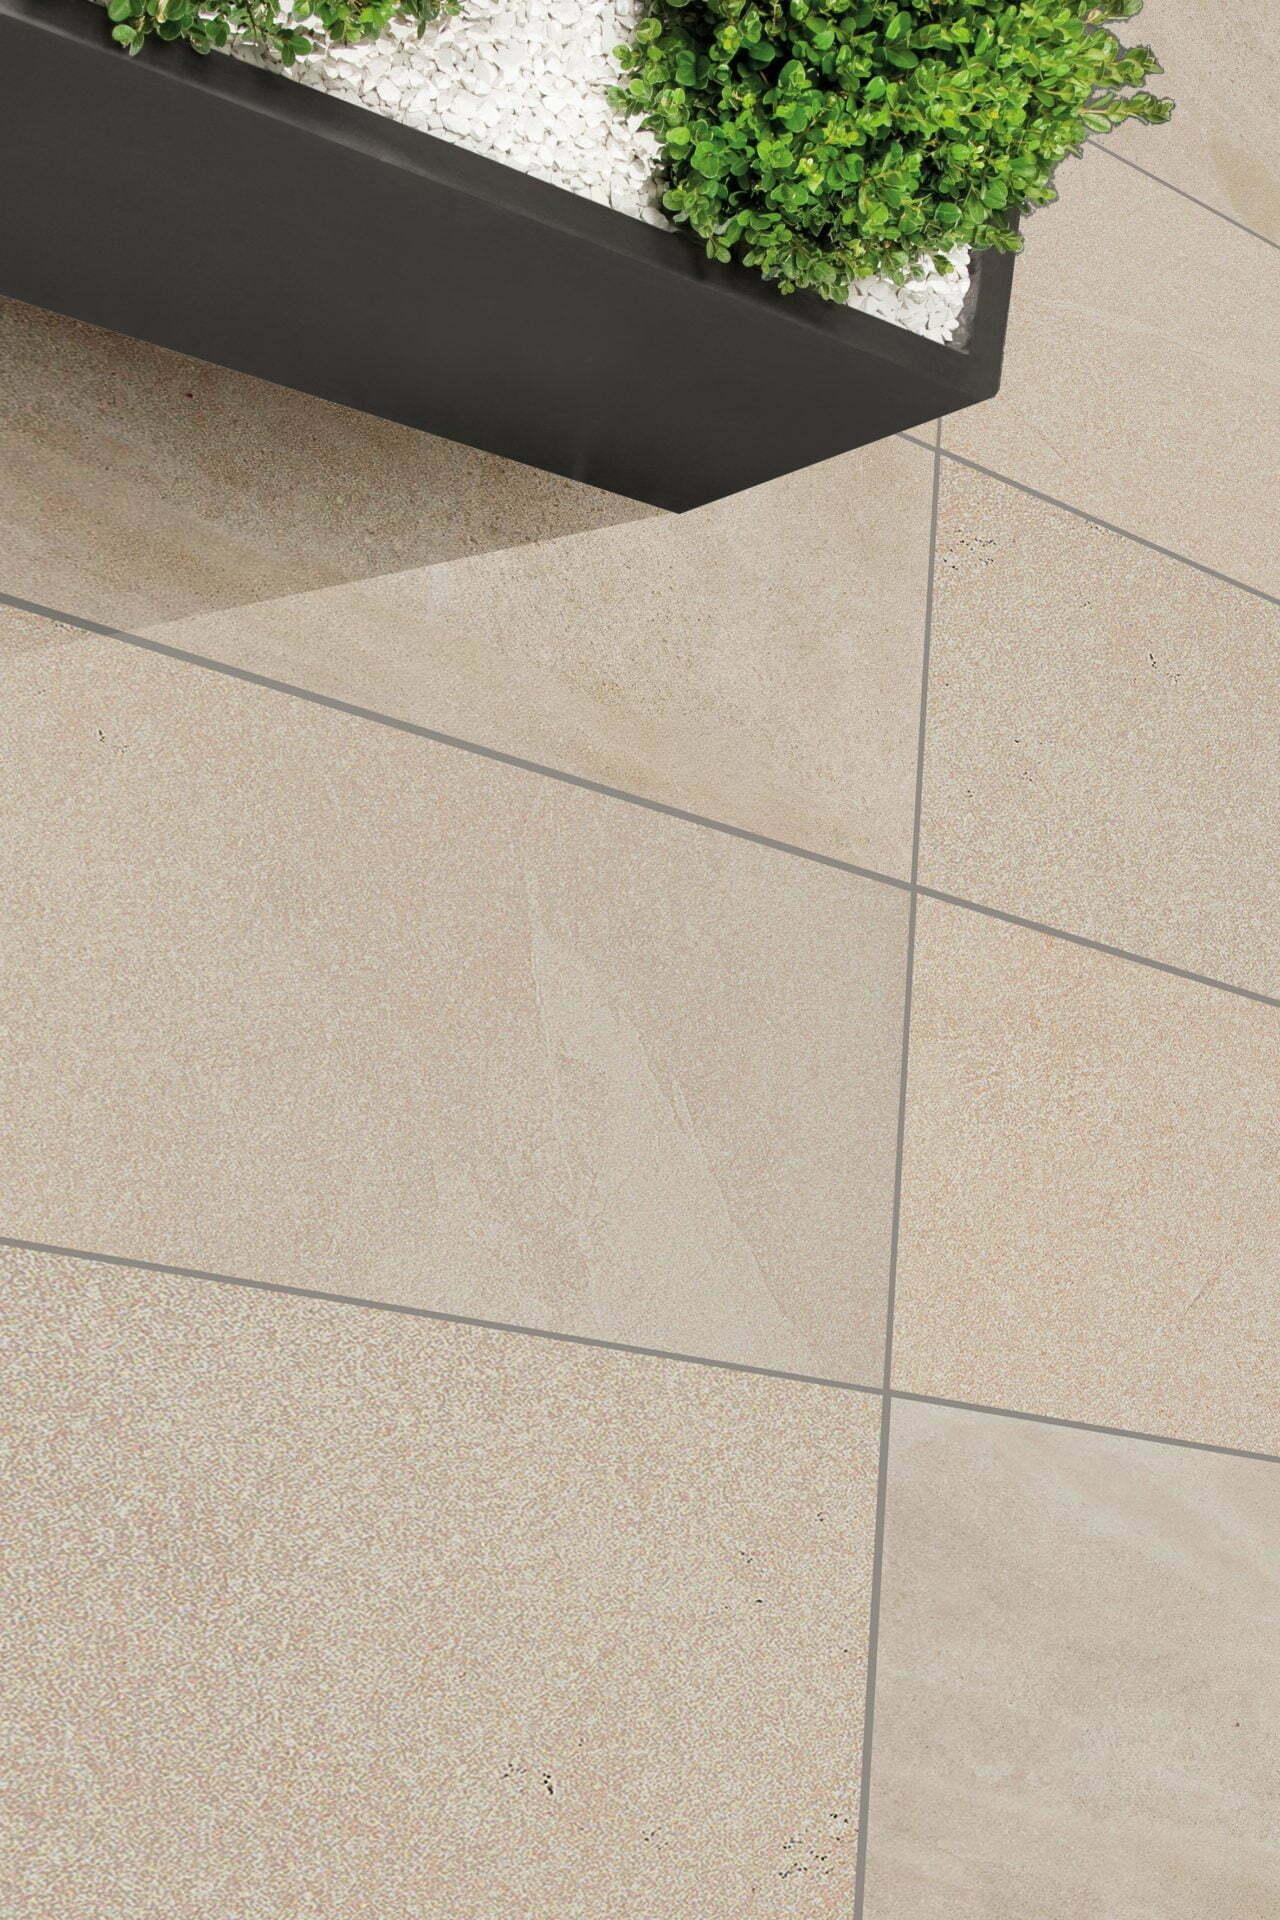 https www eurotilesandbathrooms com product petra beige 60x120cm stone effect large format porcelain tile